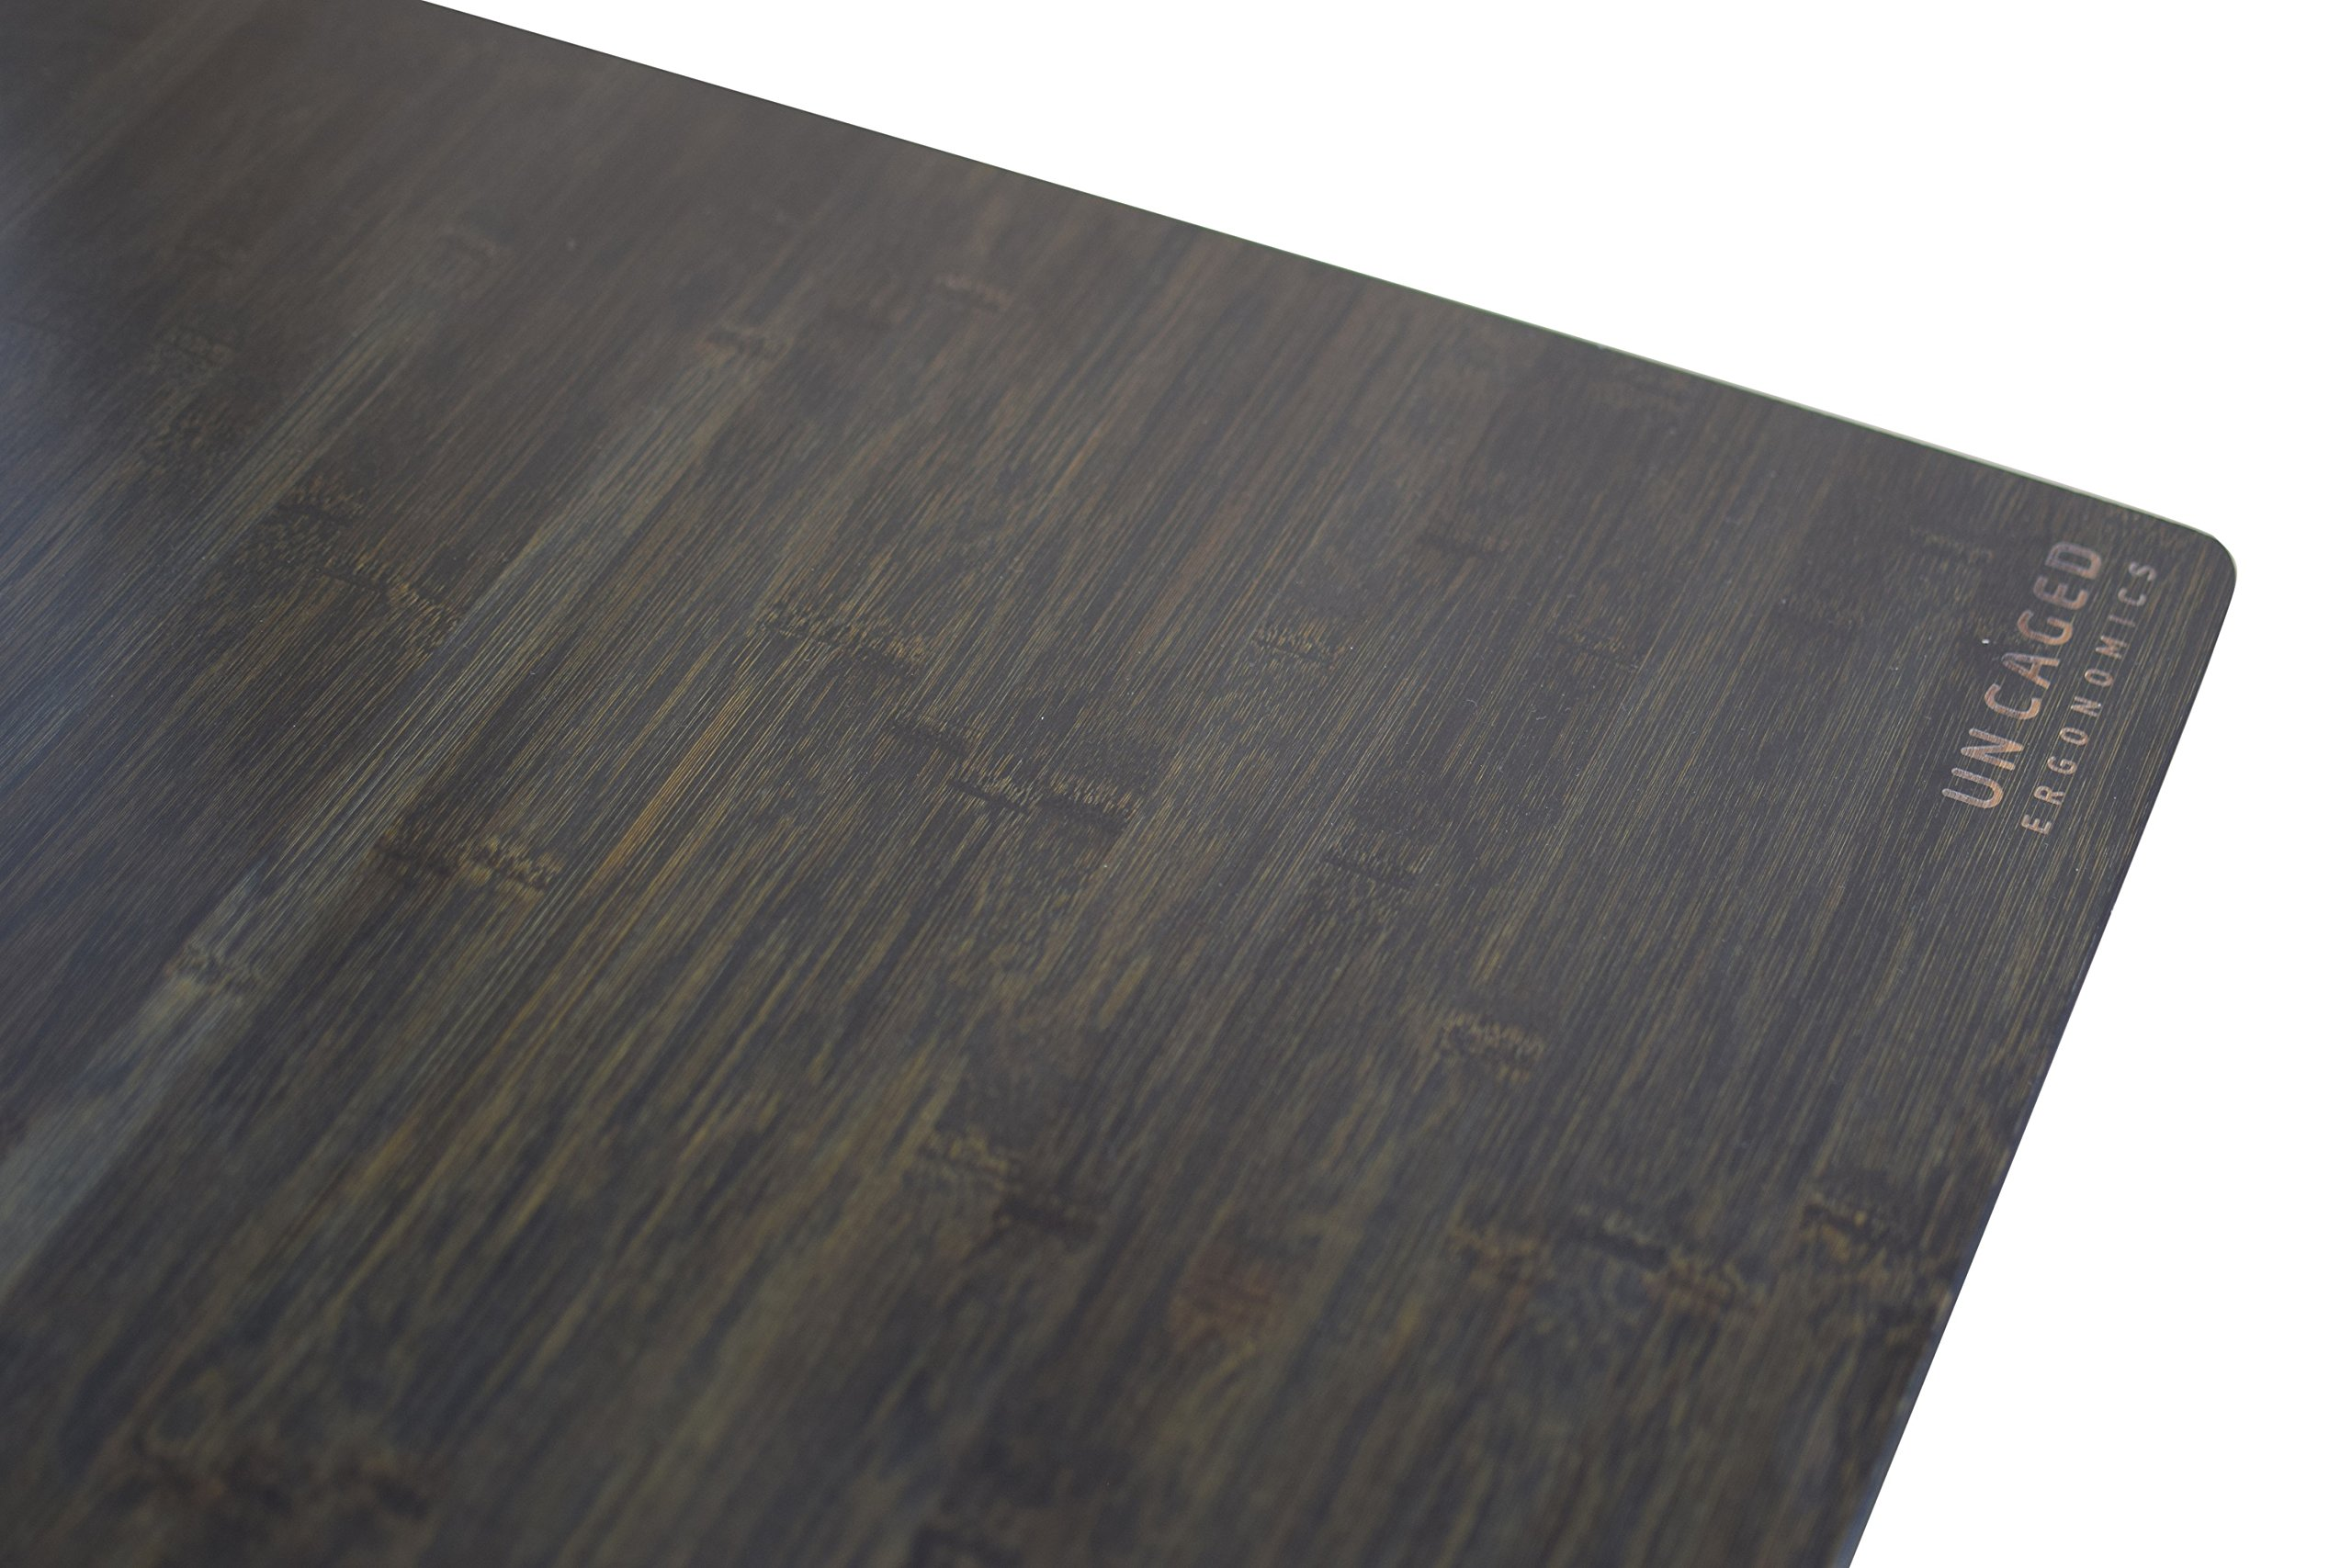 RISE UP Electric Adjustable Height Standing Desk + Beautiful Black Bamboo Desktop| Memory Keypad| 2 Motors| Affordable Ergonomic Sit Stand Office Desk by Uncaged Ergonomics (Image #9)